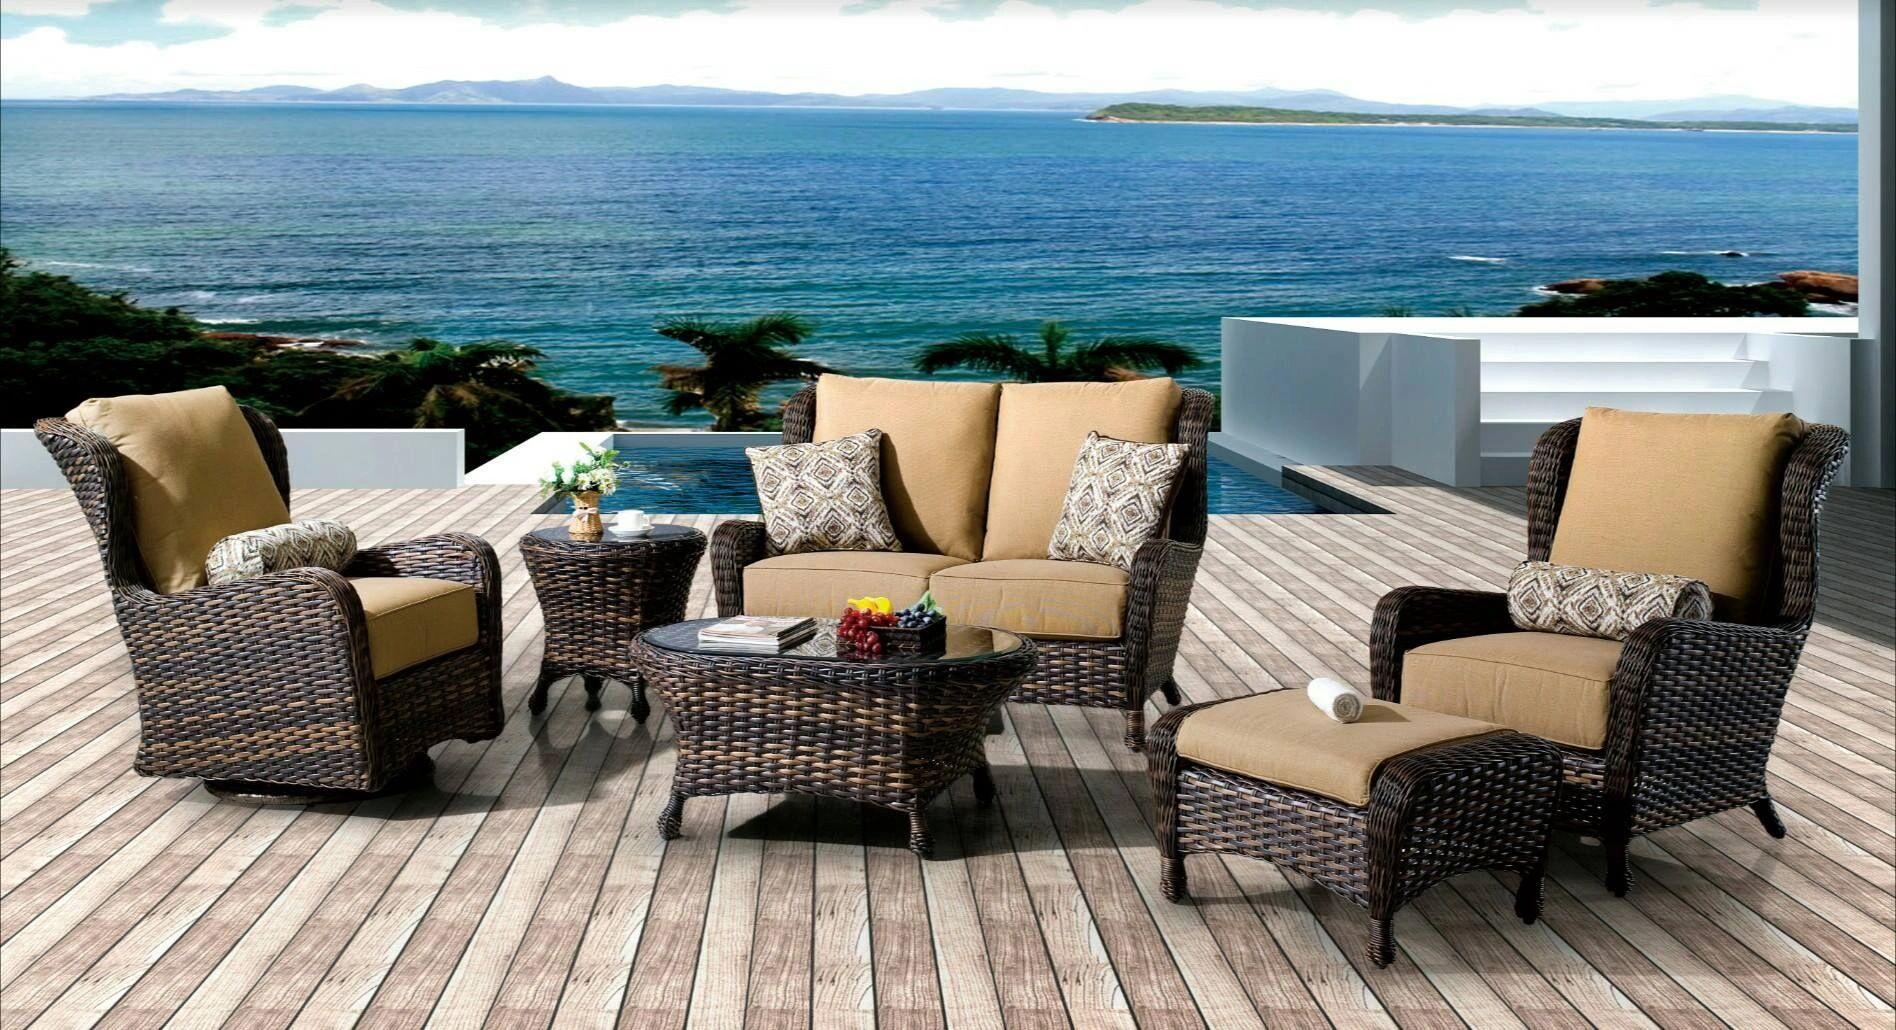 Tremendous Dreamweaver Furniture All Weather Furniture Download Free Architecture Designs Scobabritishbridgeorg